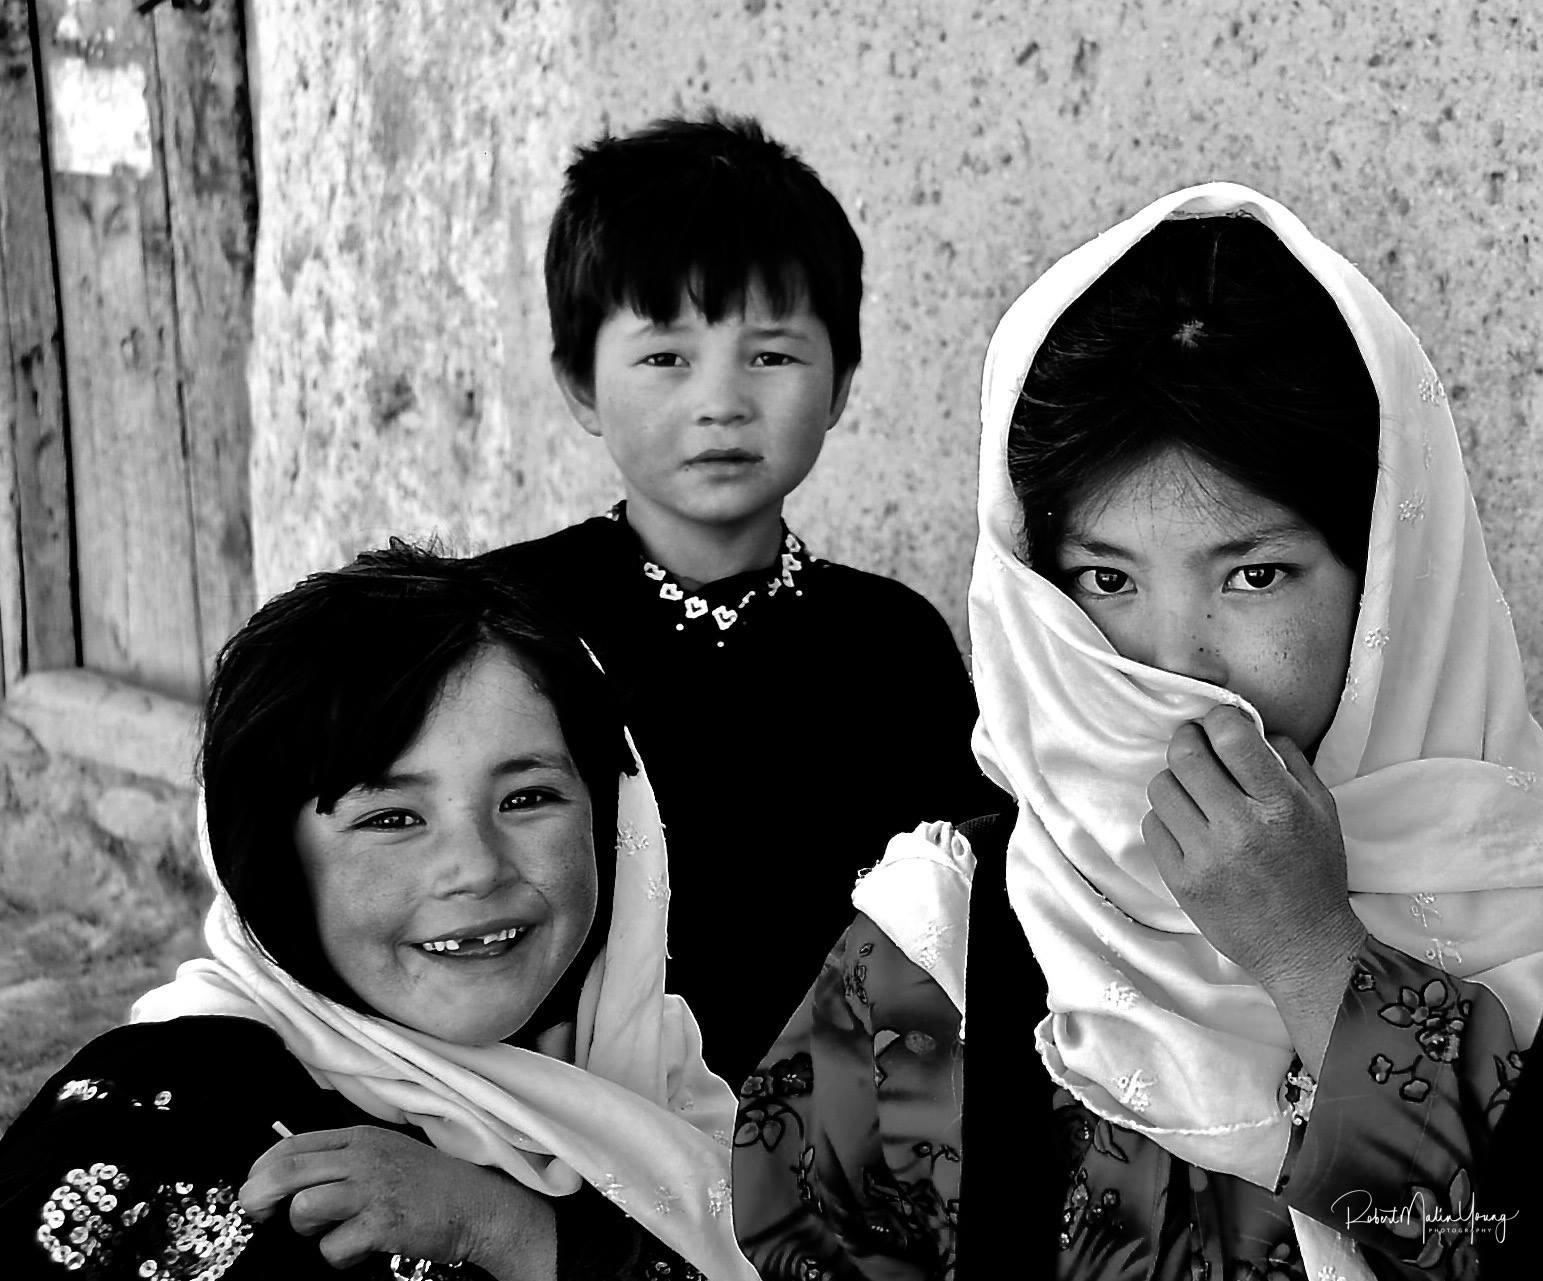 Young Afghan children - Bamiyan 2018 by Robert Malin Young